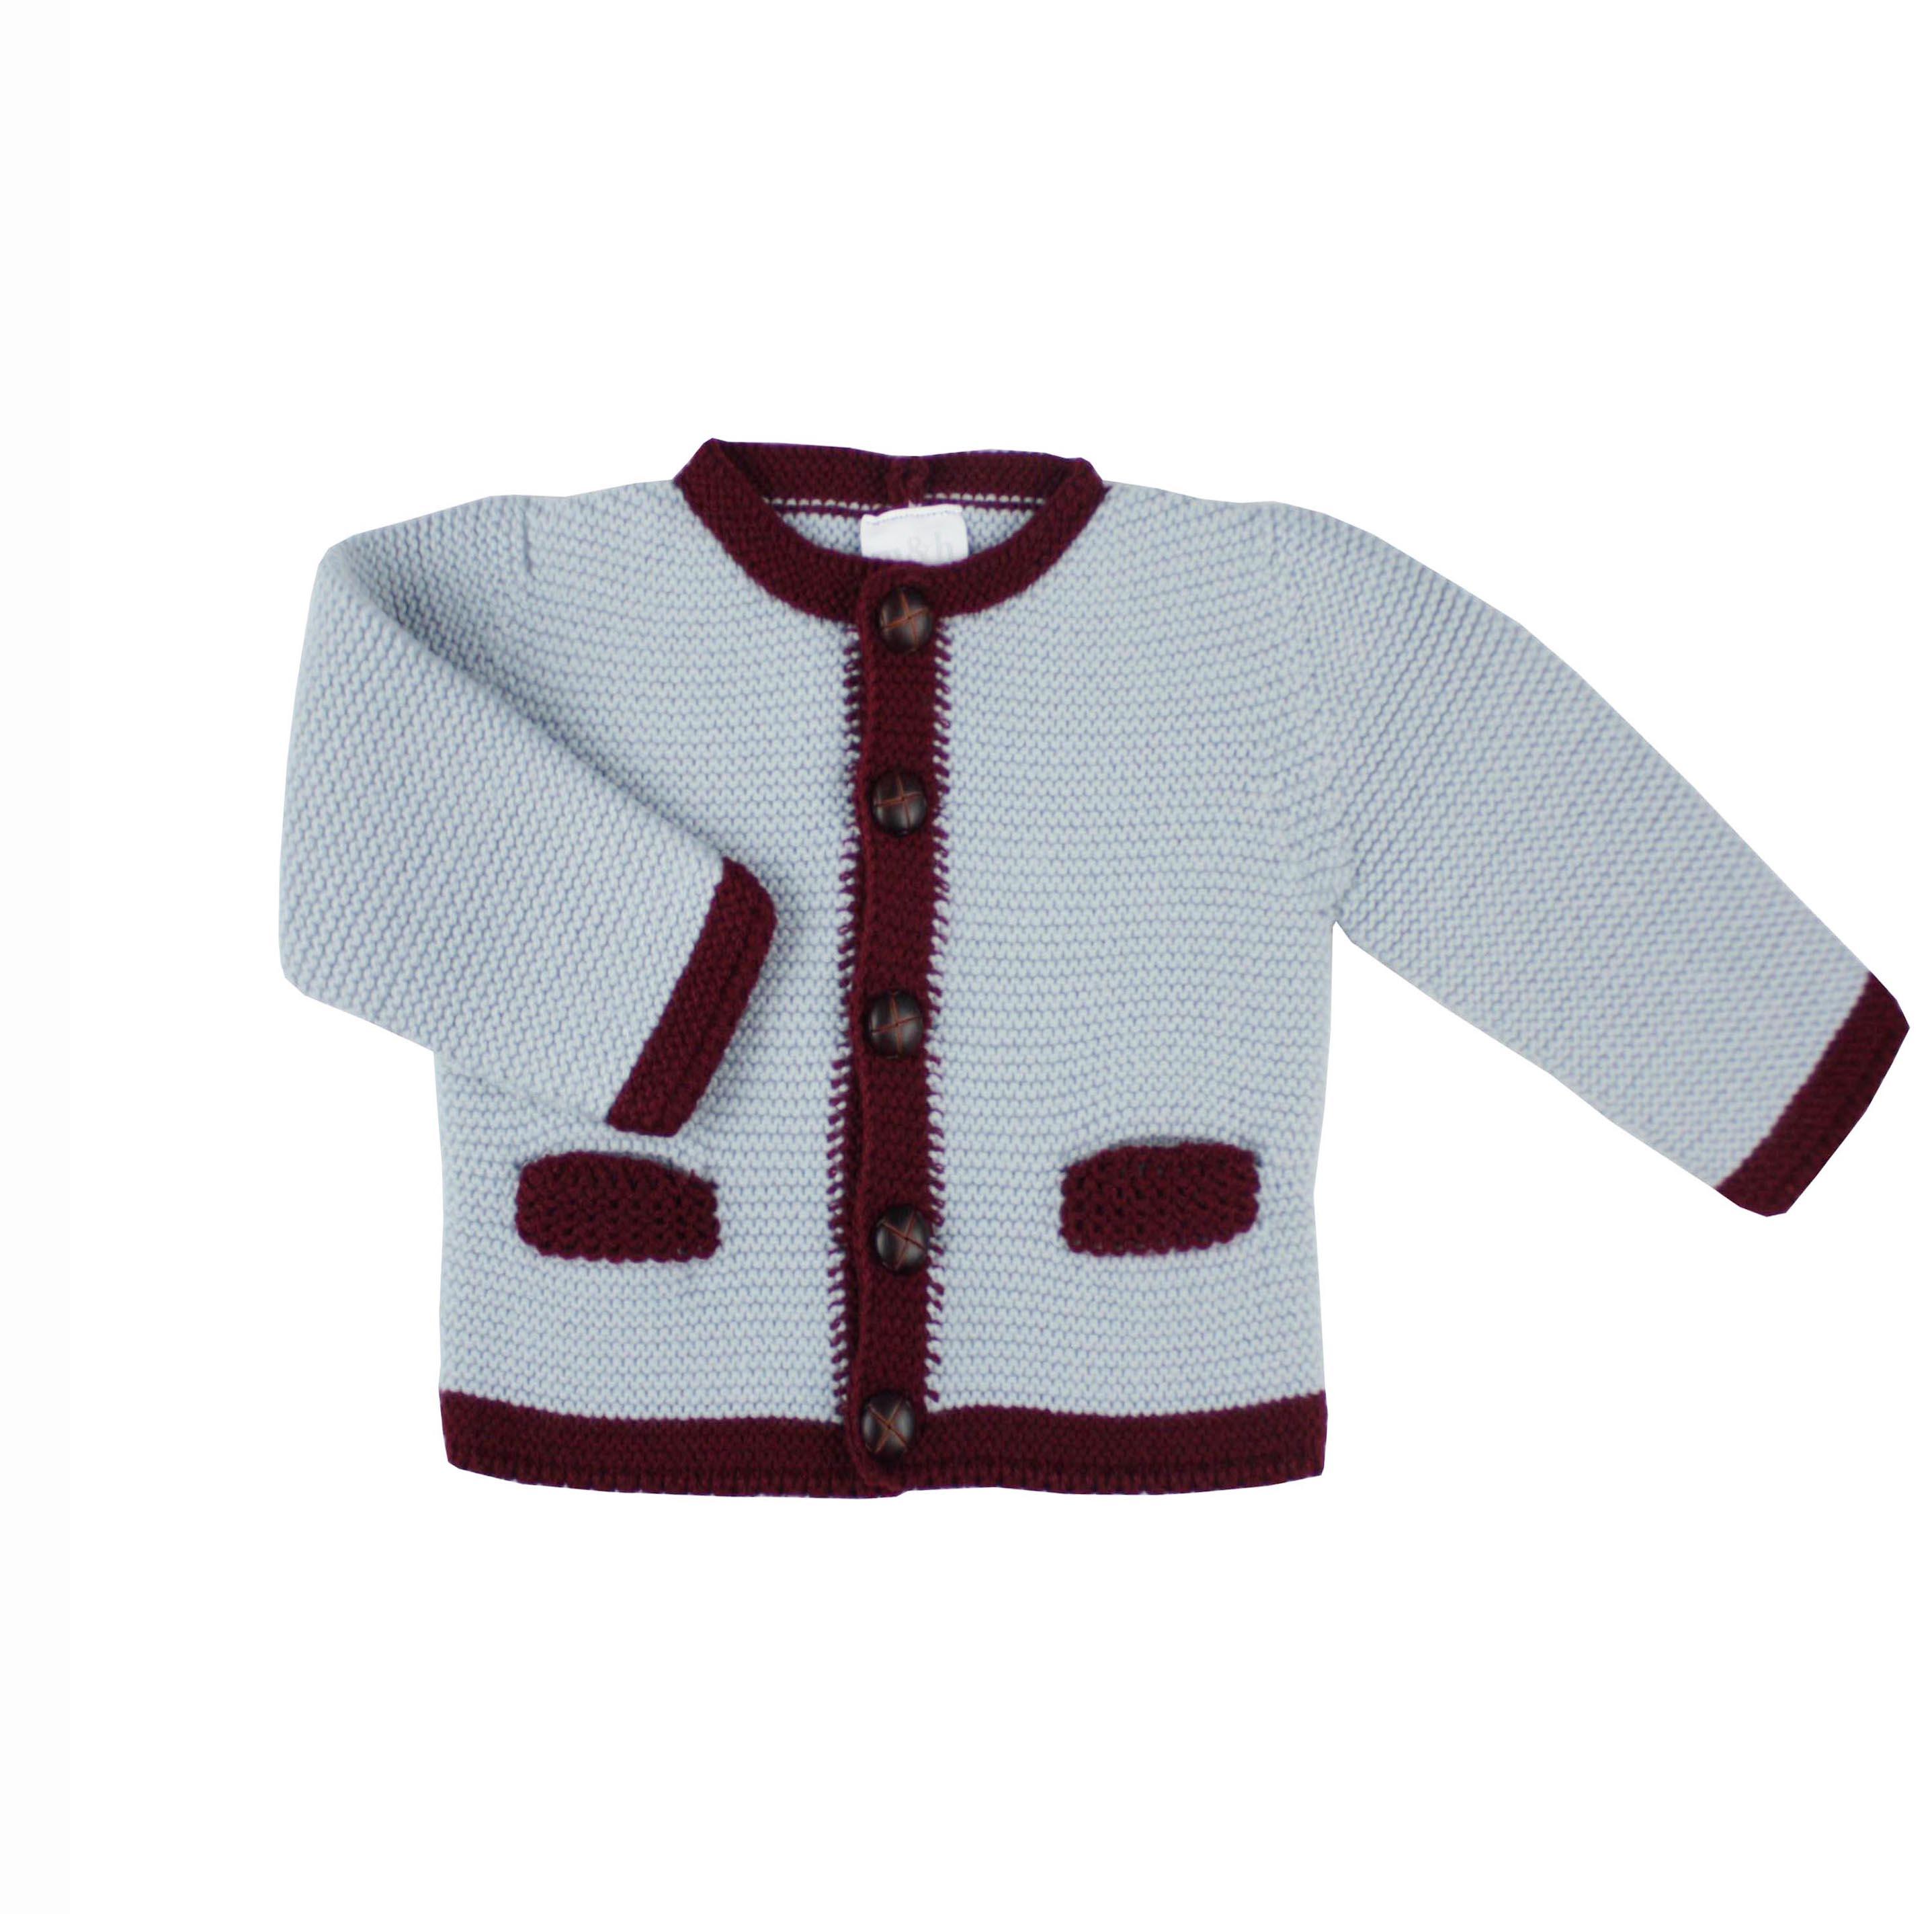 8292c922782c6 Knitted Austrian cardigan. Grey and burgundy.